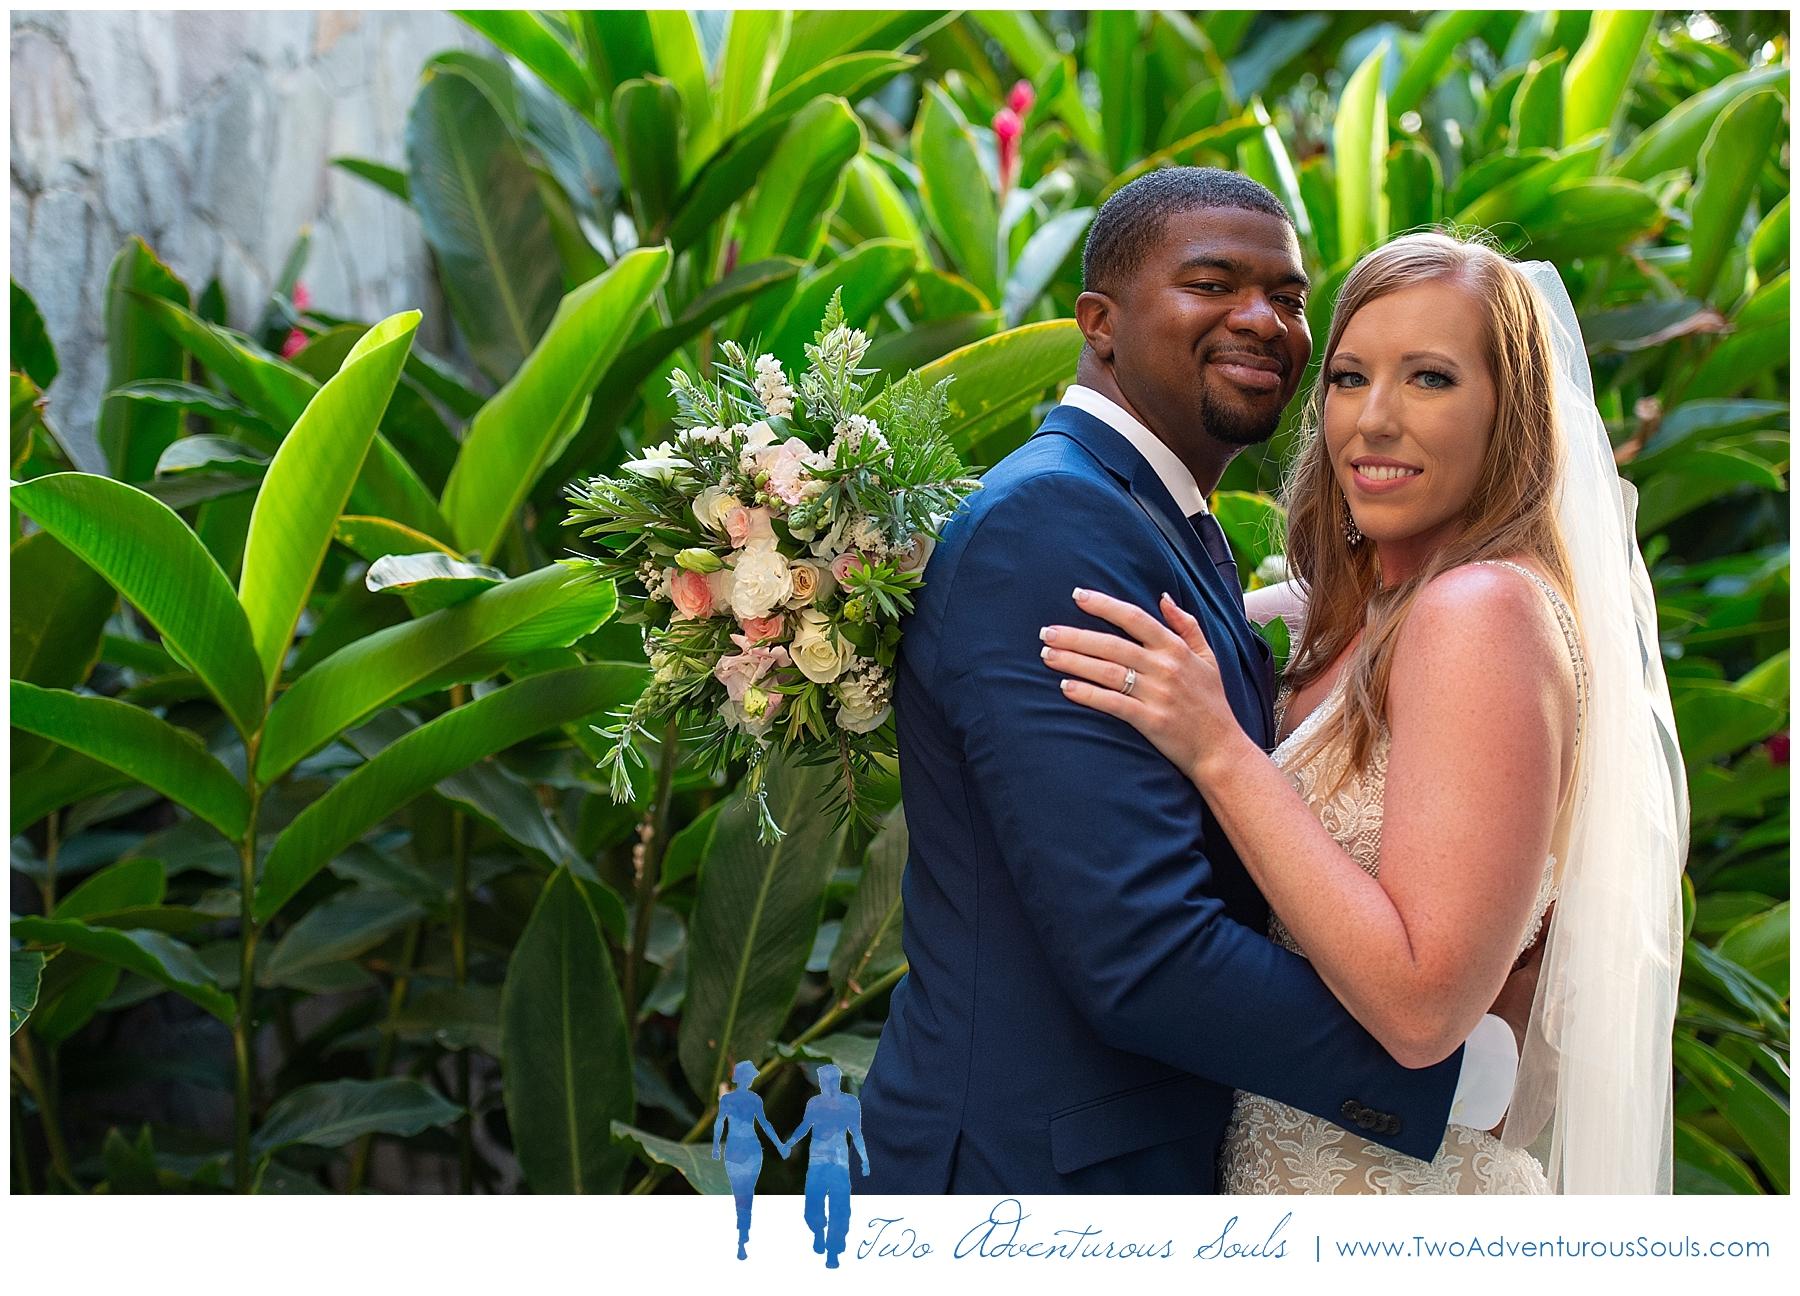 Costa Rica Wedding Photographers, Dreams las Mareas Wedding, Destination Wedding Photographers, Two Adventurous Souls - 022219_0031.jpg